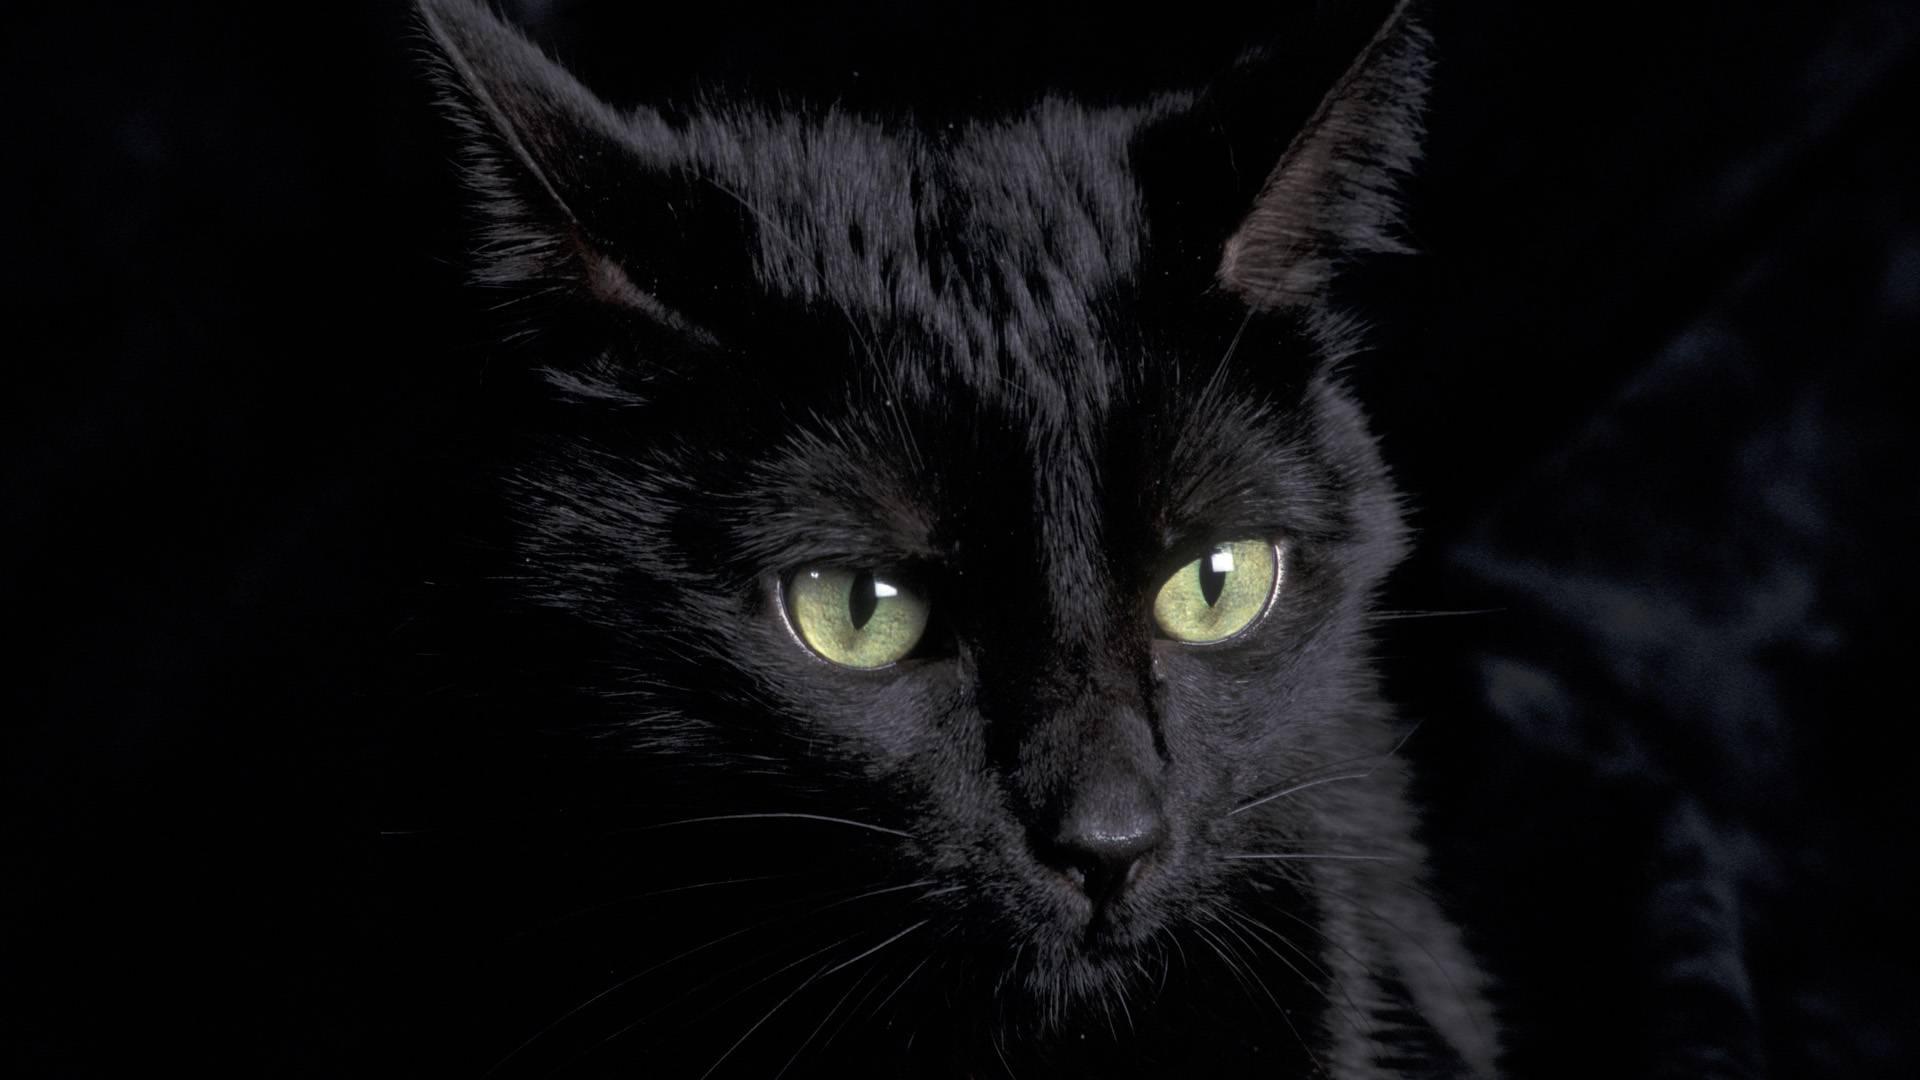 43 Black Cat Eyes Wallpaper On Wallpapersafari